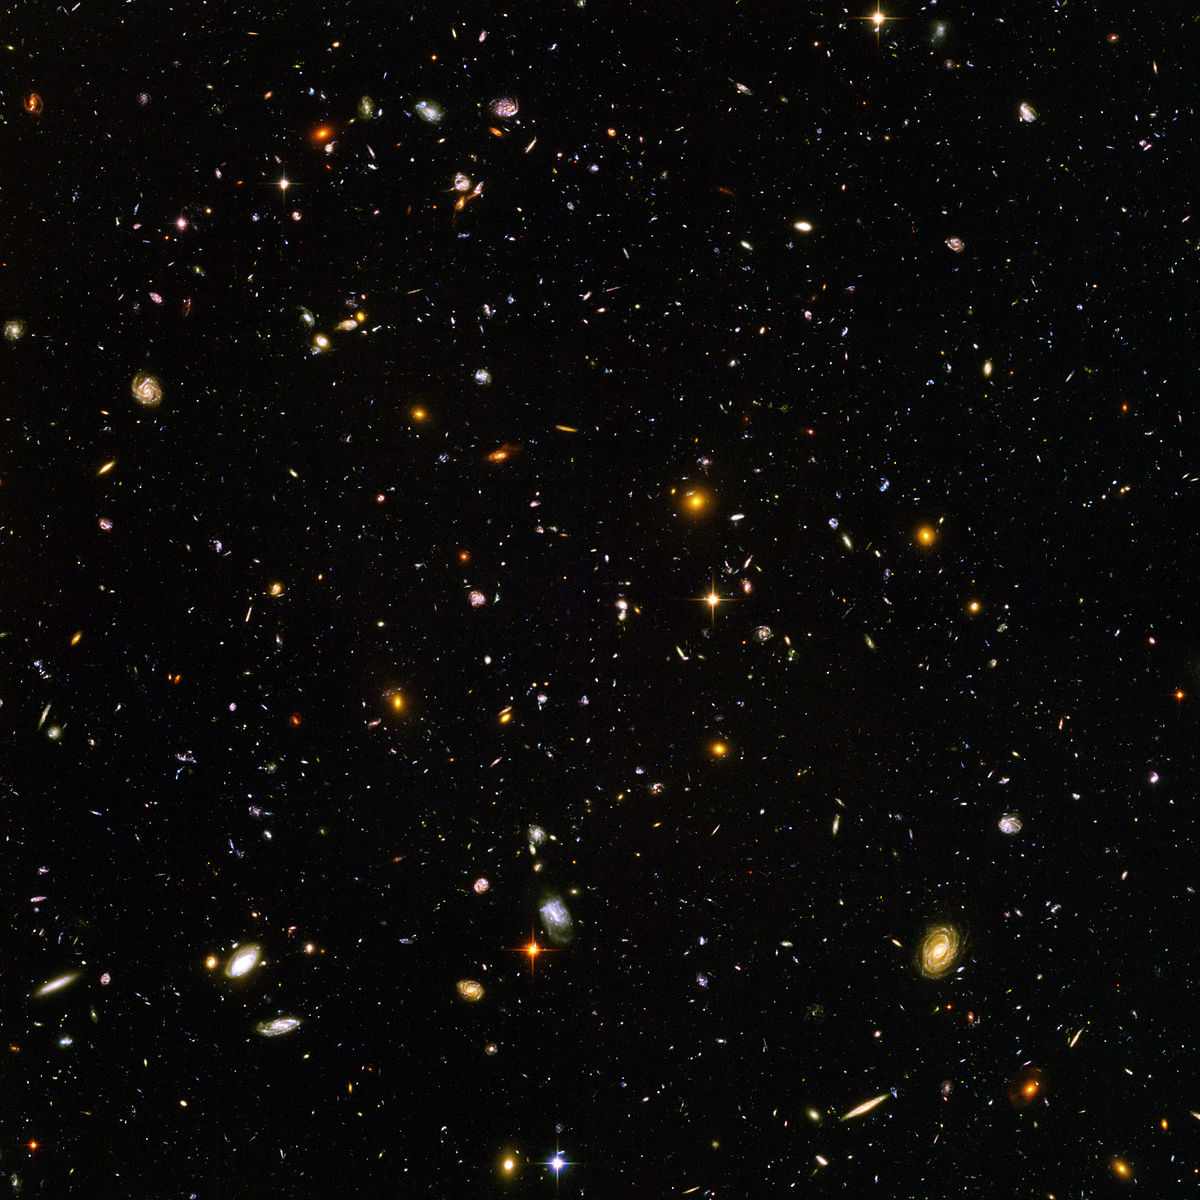 m12 Око в небе   космические обсерватории